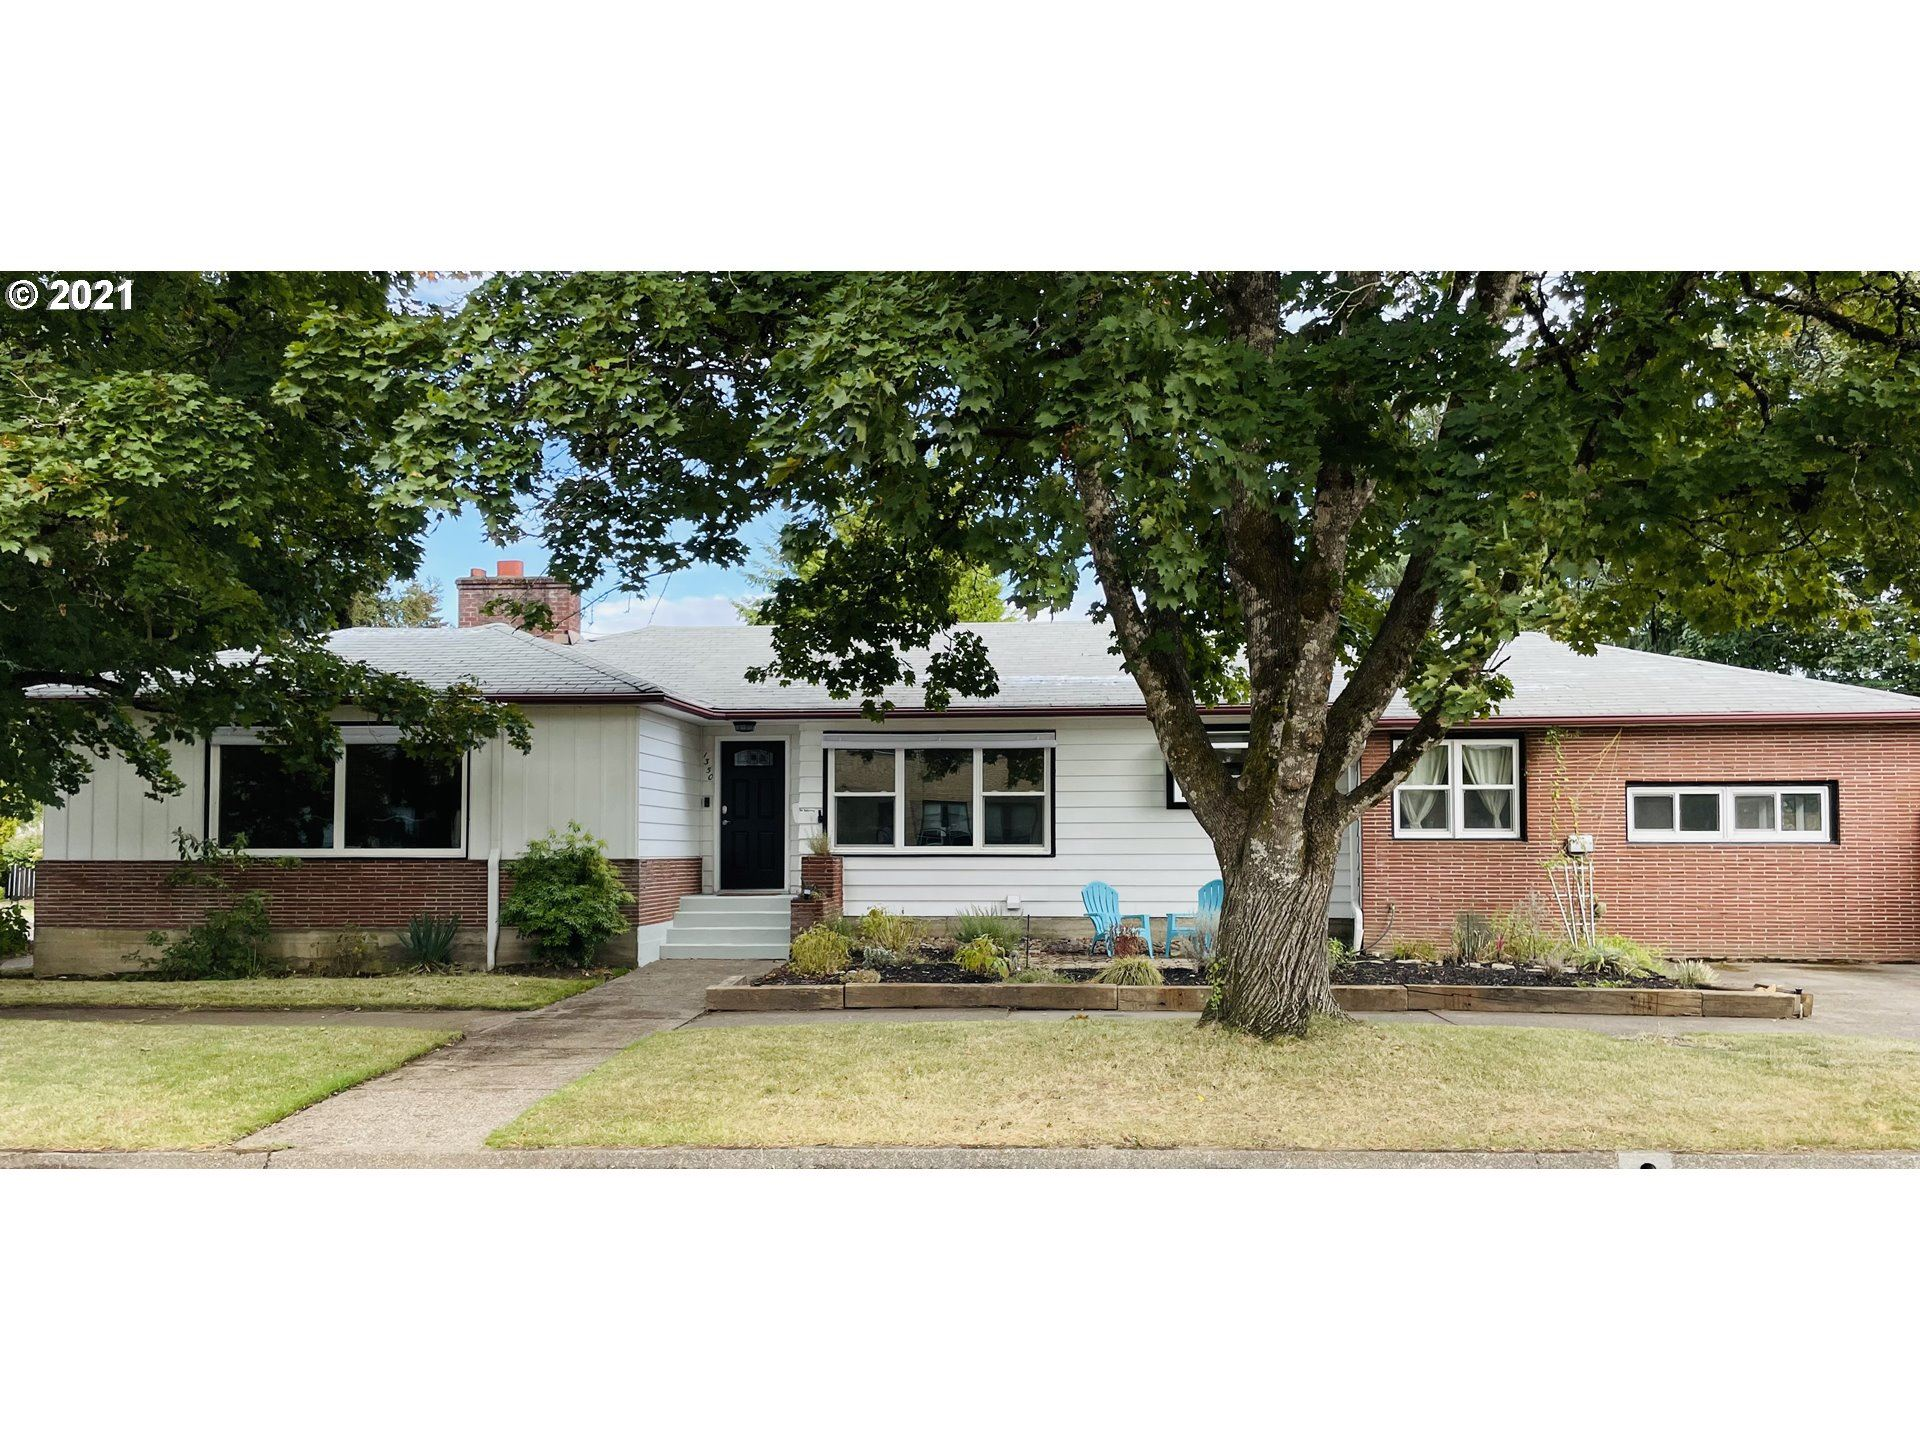 Photo of 1350 NE DAVIS ST, McMinnville, OR 97128 (MLS # 21562194)